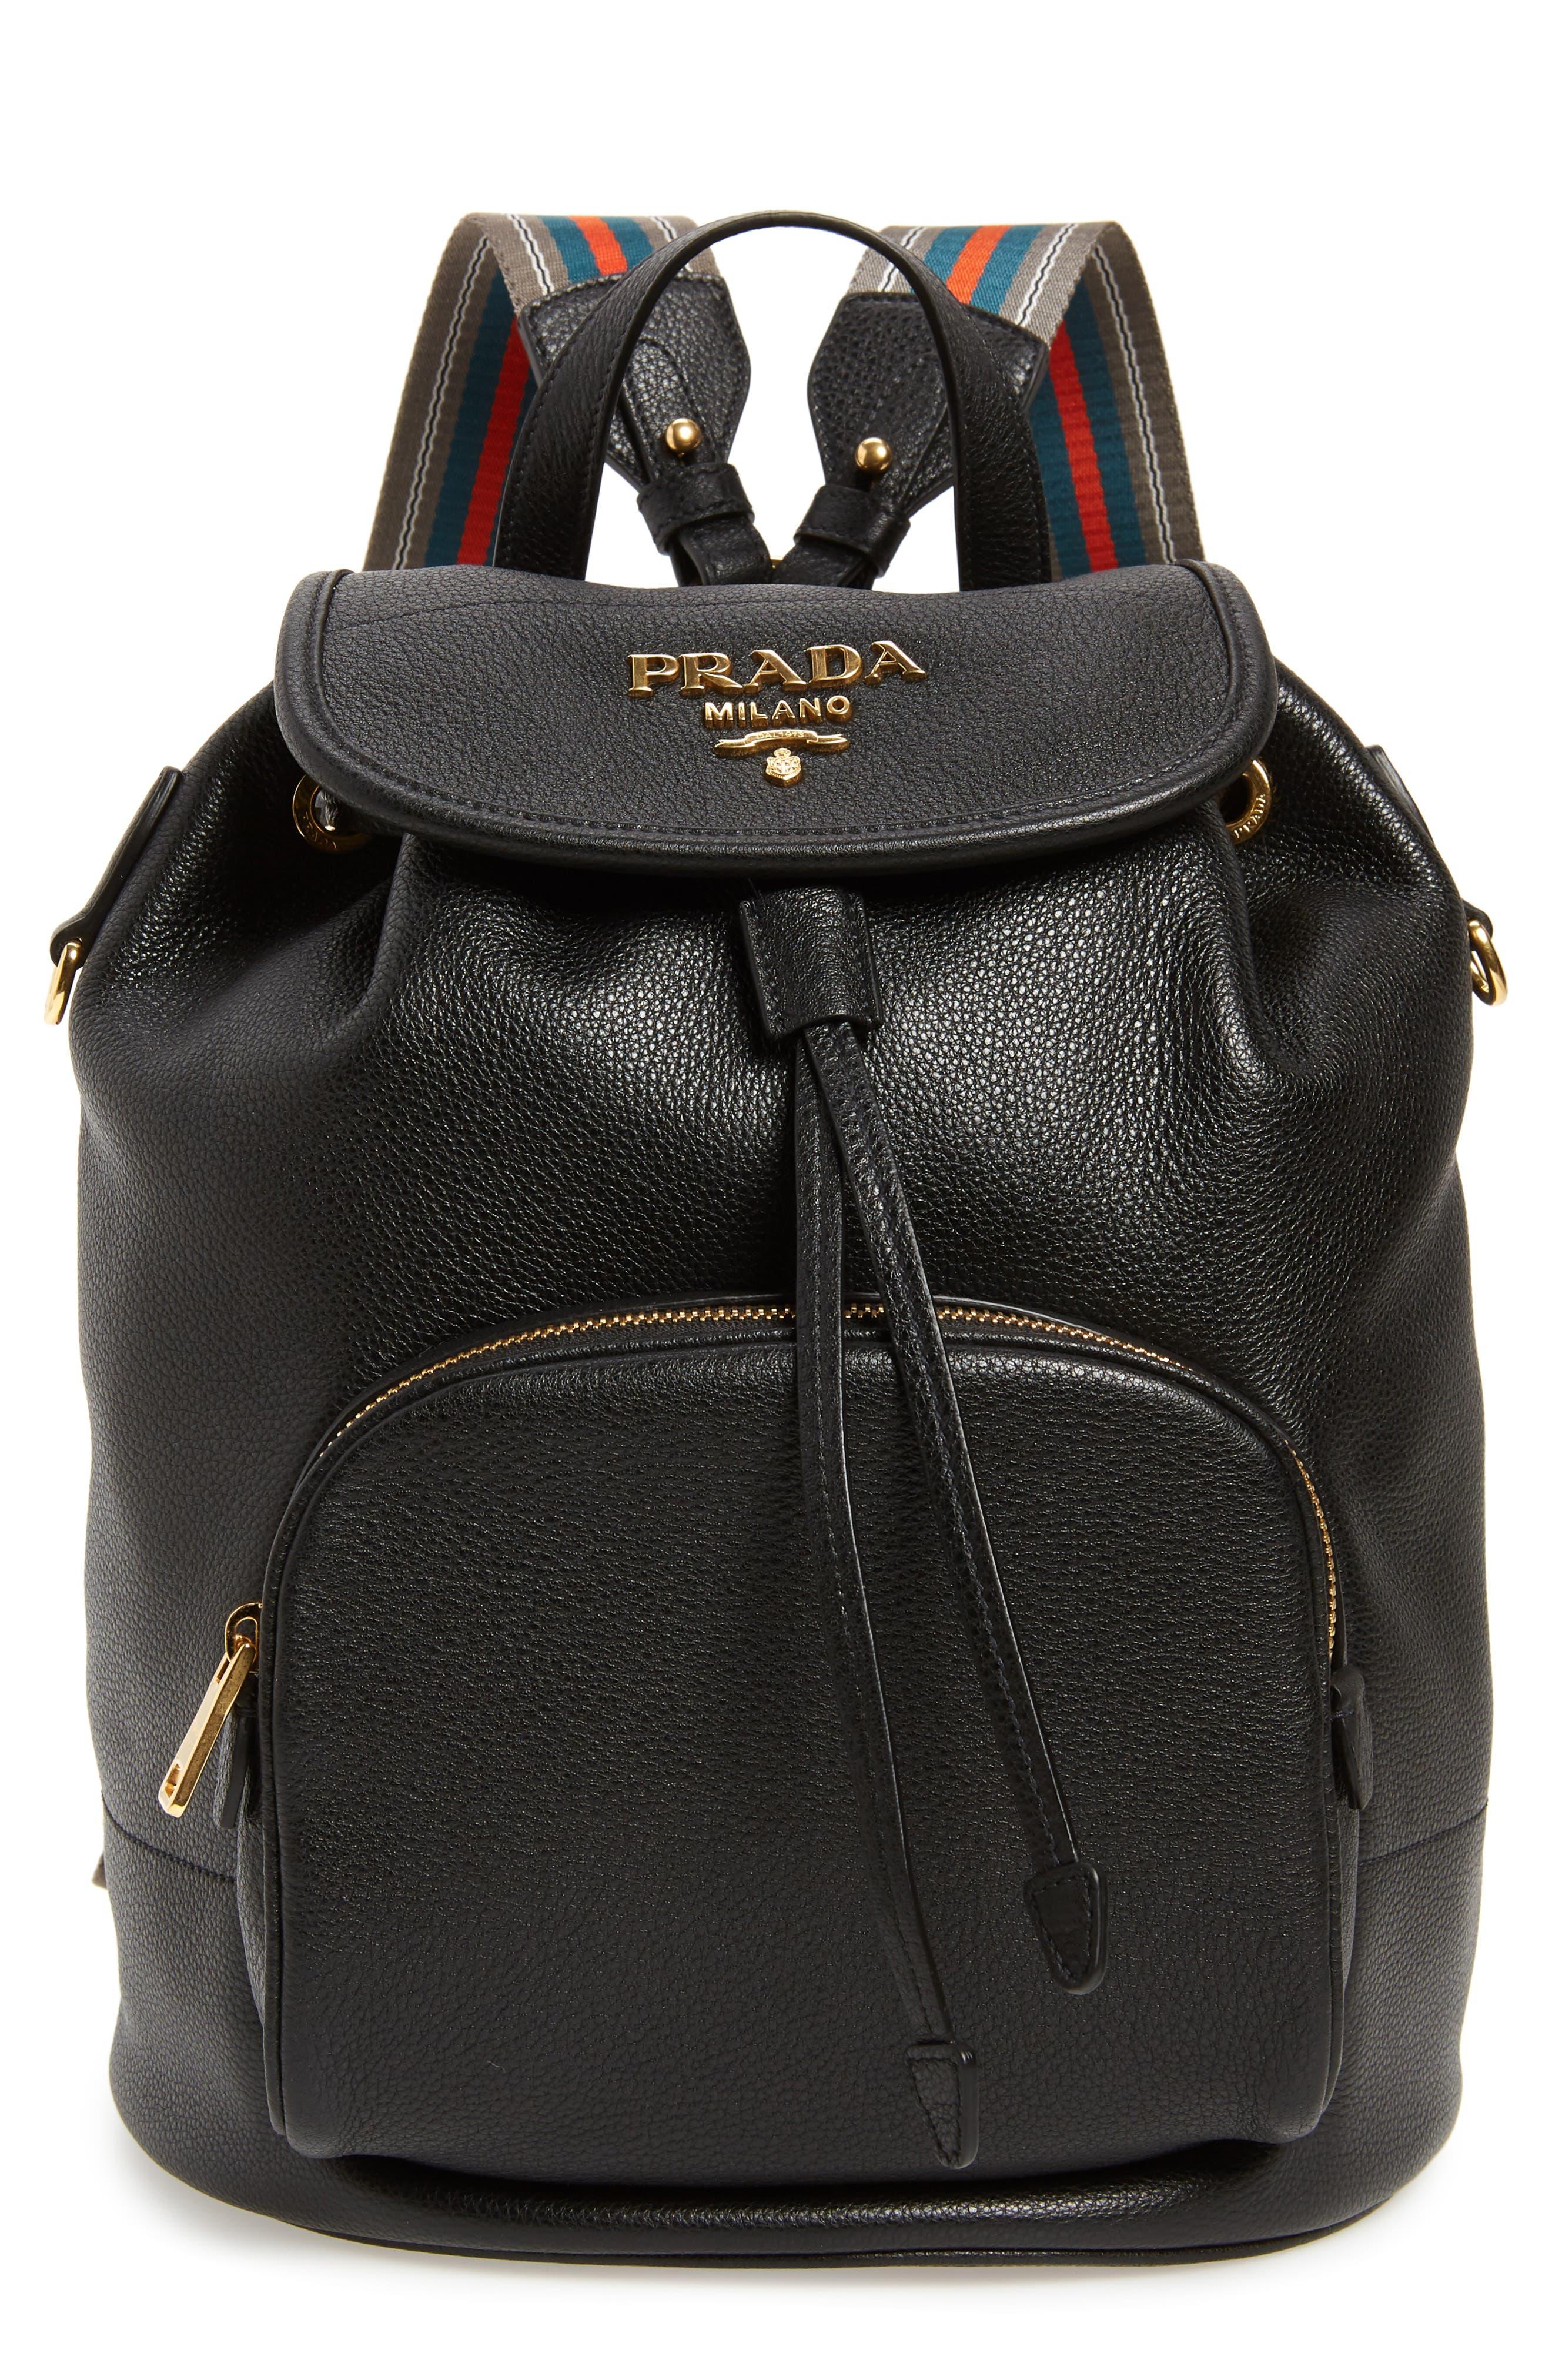 PRADA Vitello Daino Pebbled Leather Backpack, Main, color, 001